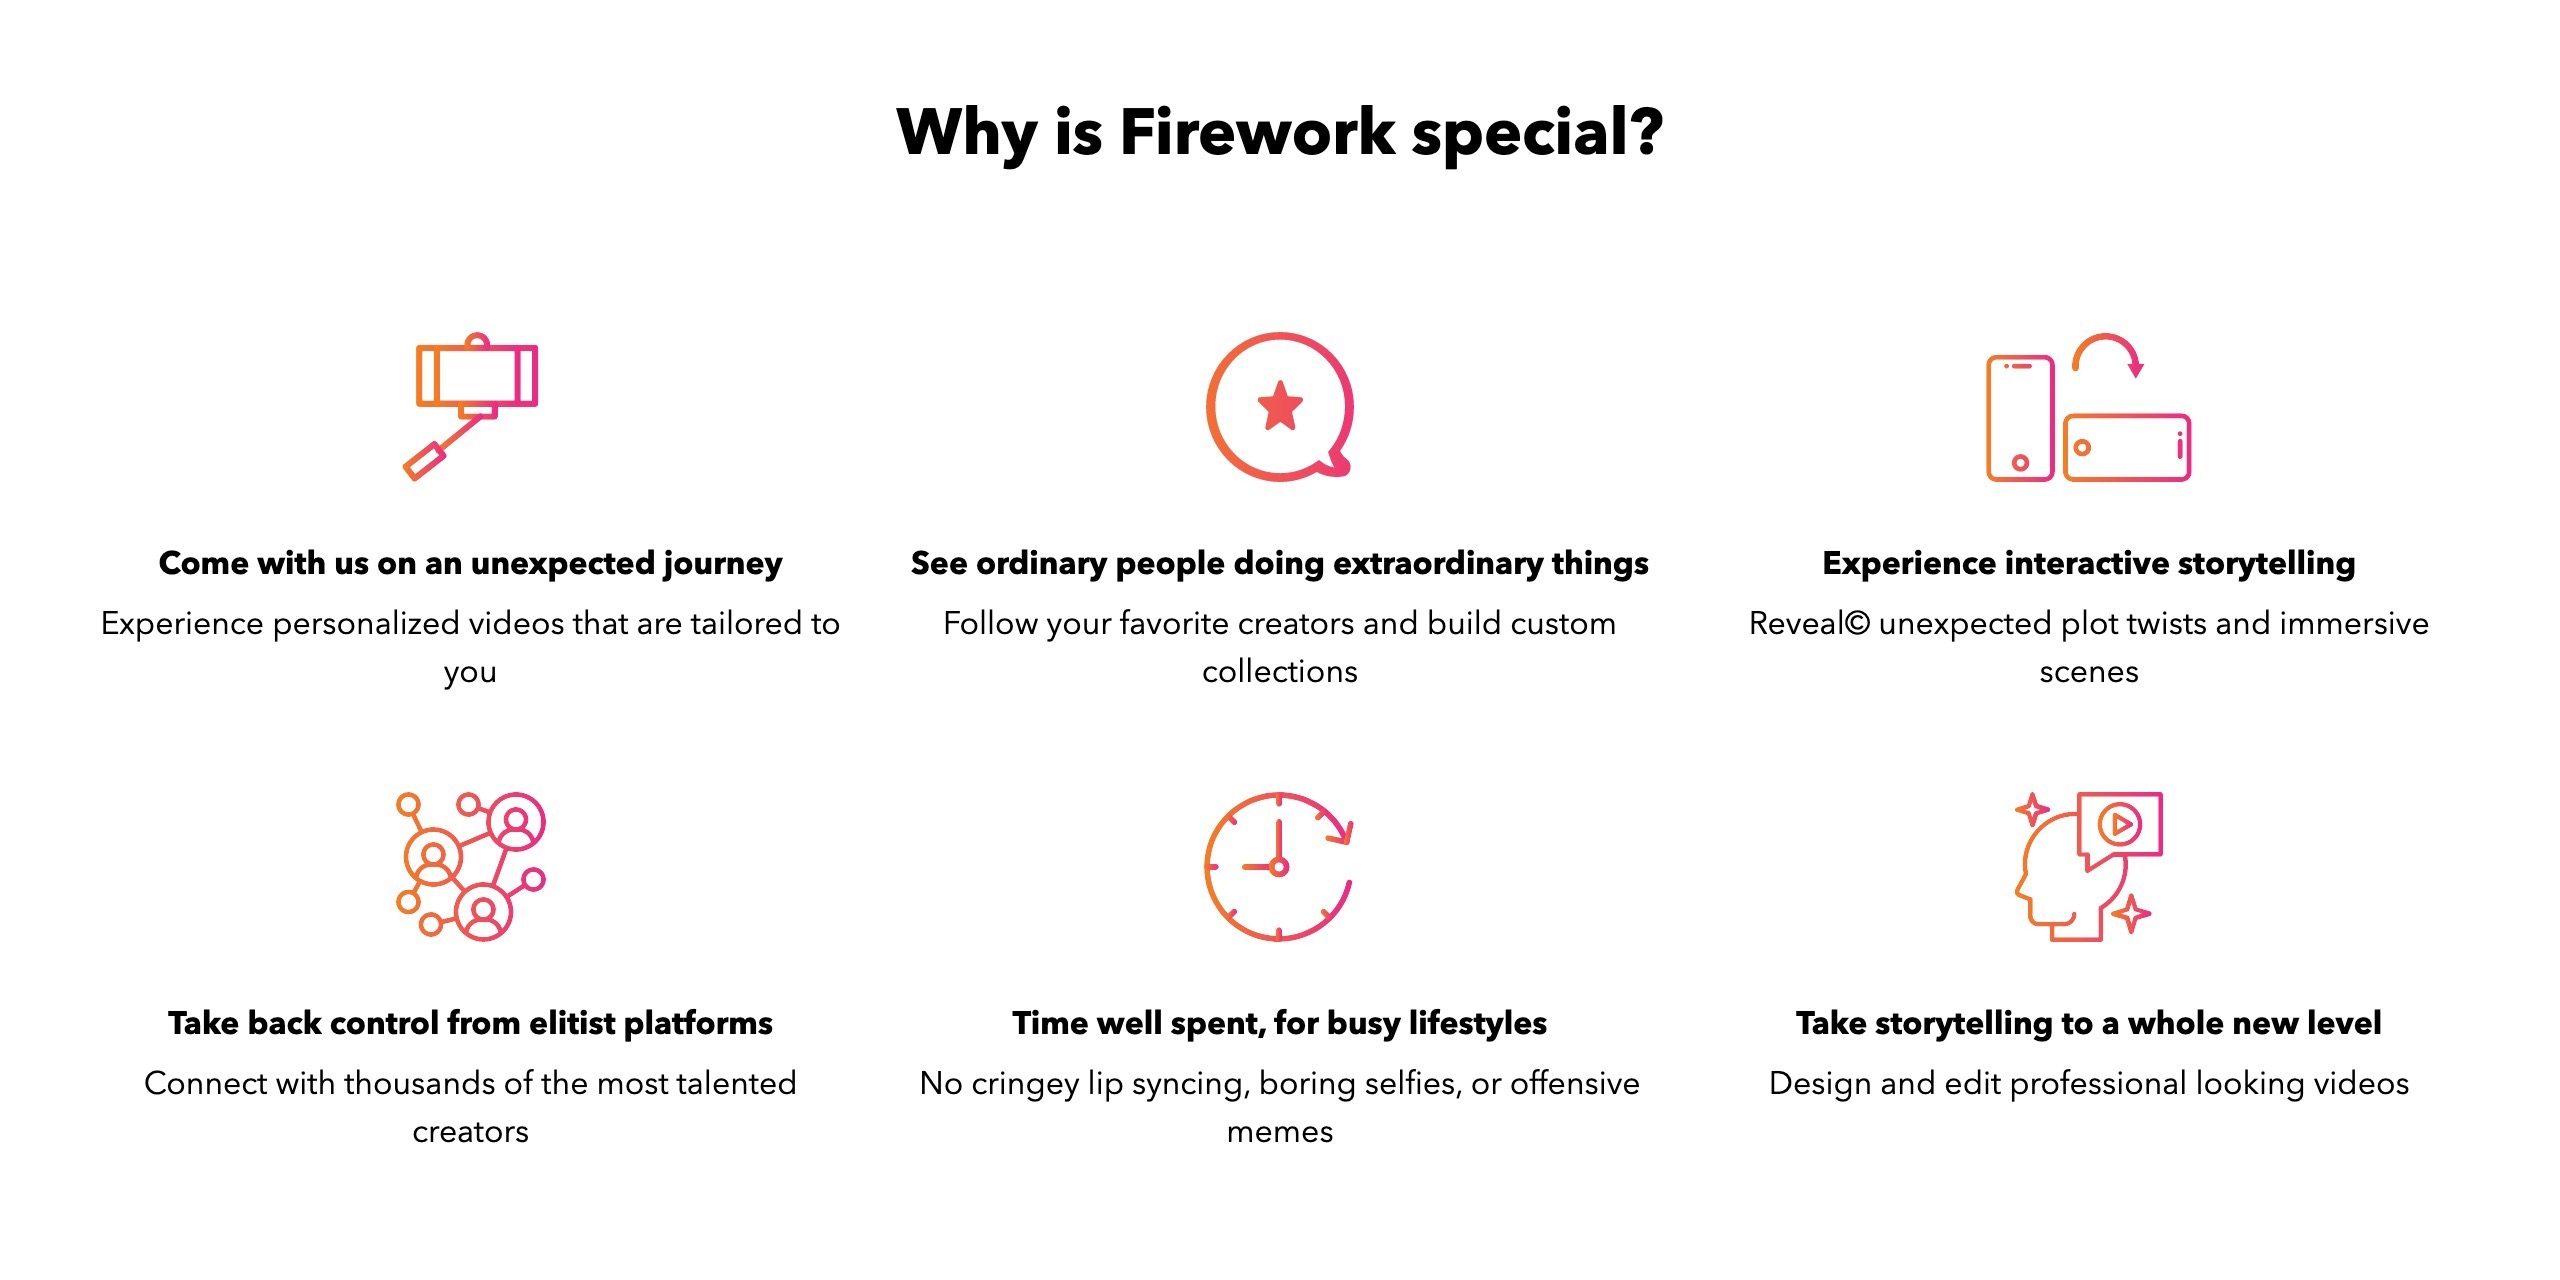 firework special